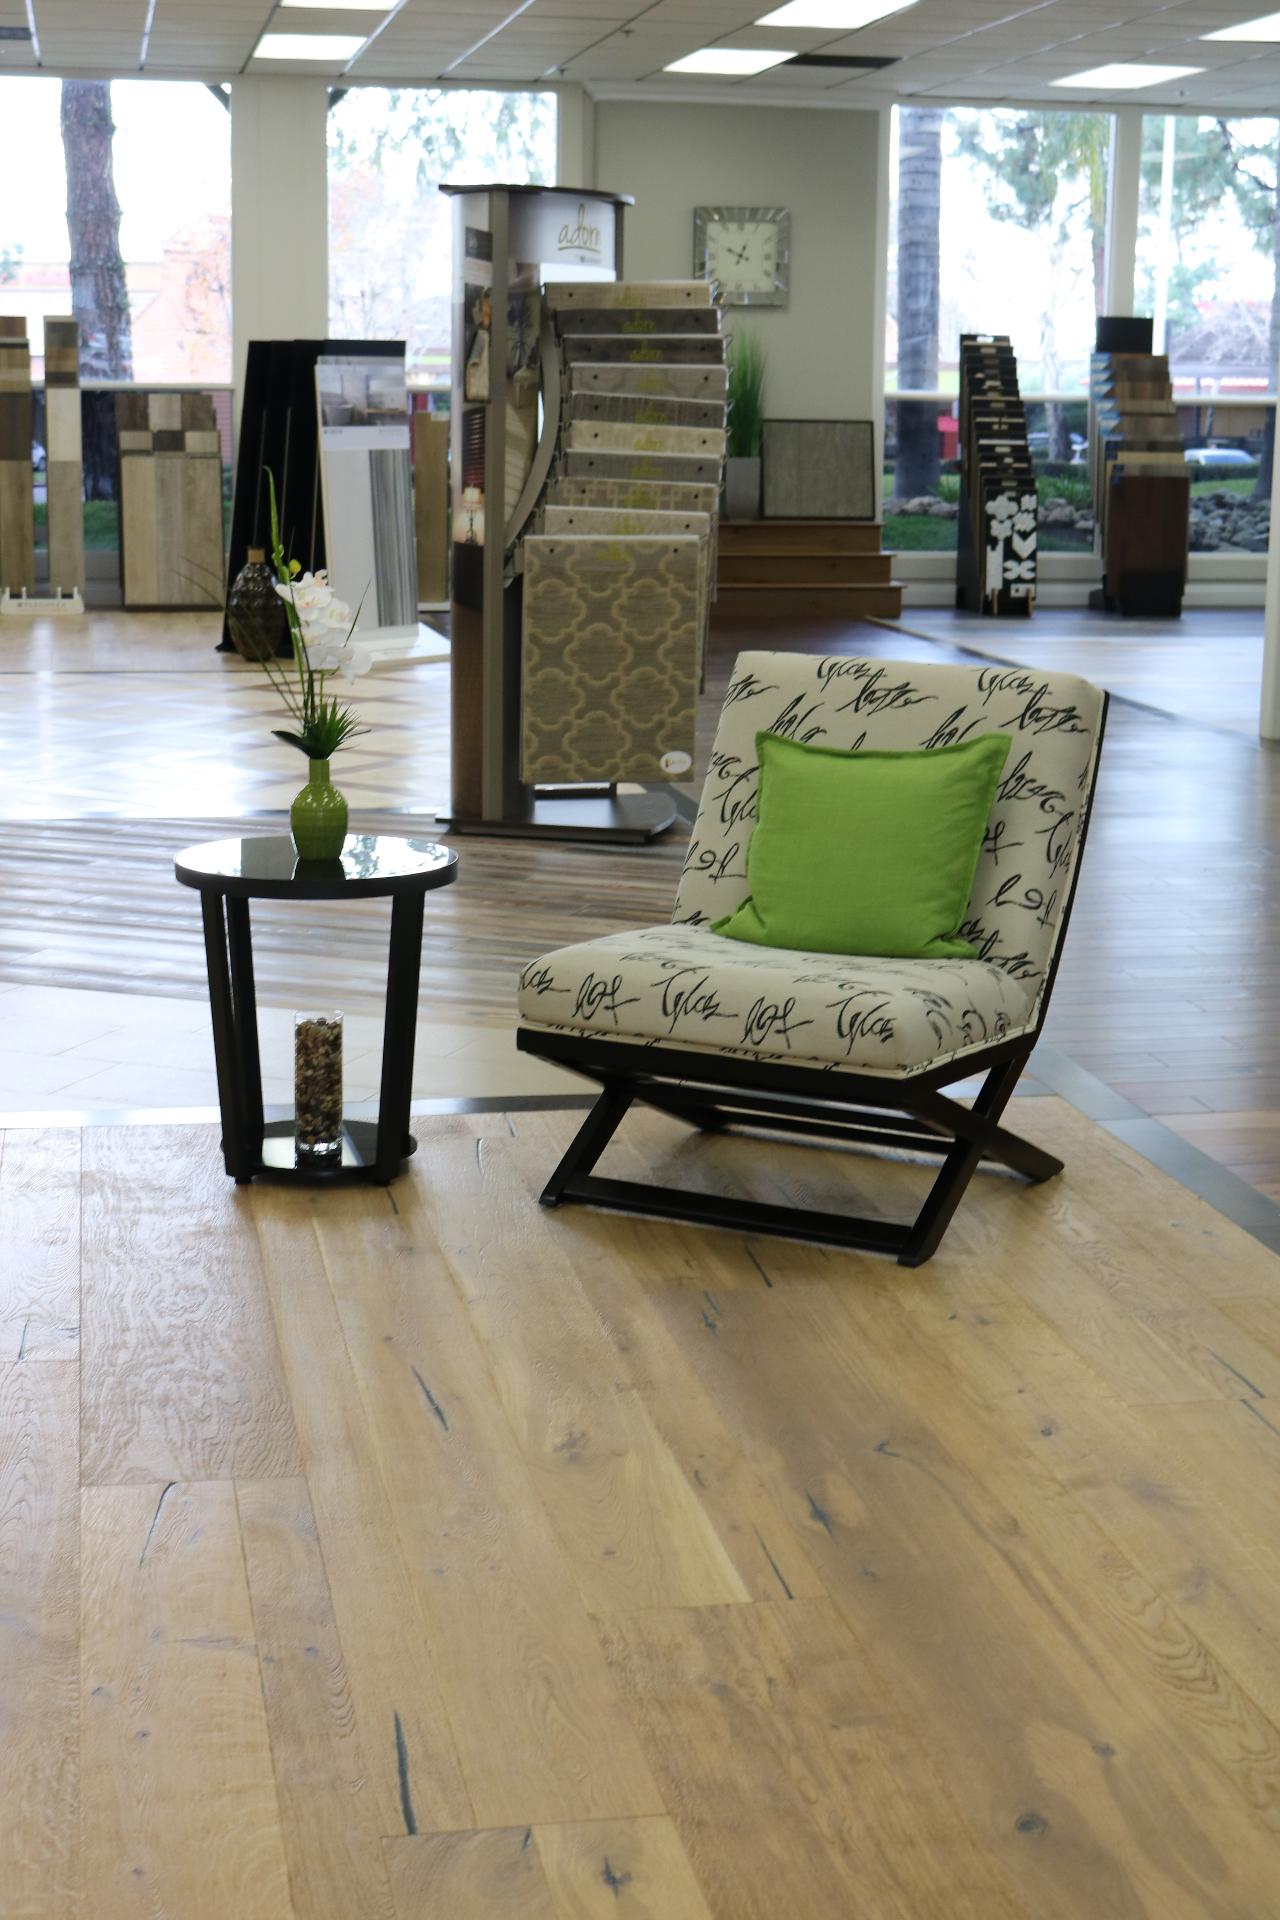 Kindred Flooring Showroom  Display of Urban Floor  Composer Bach